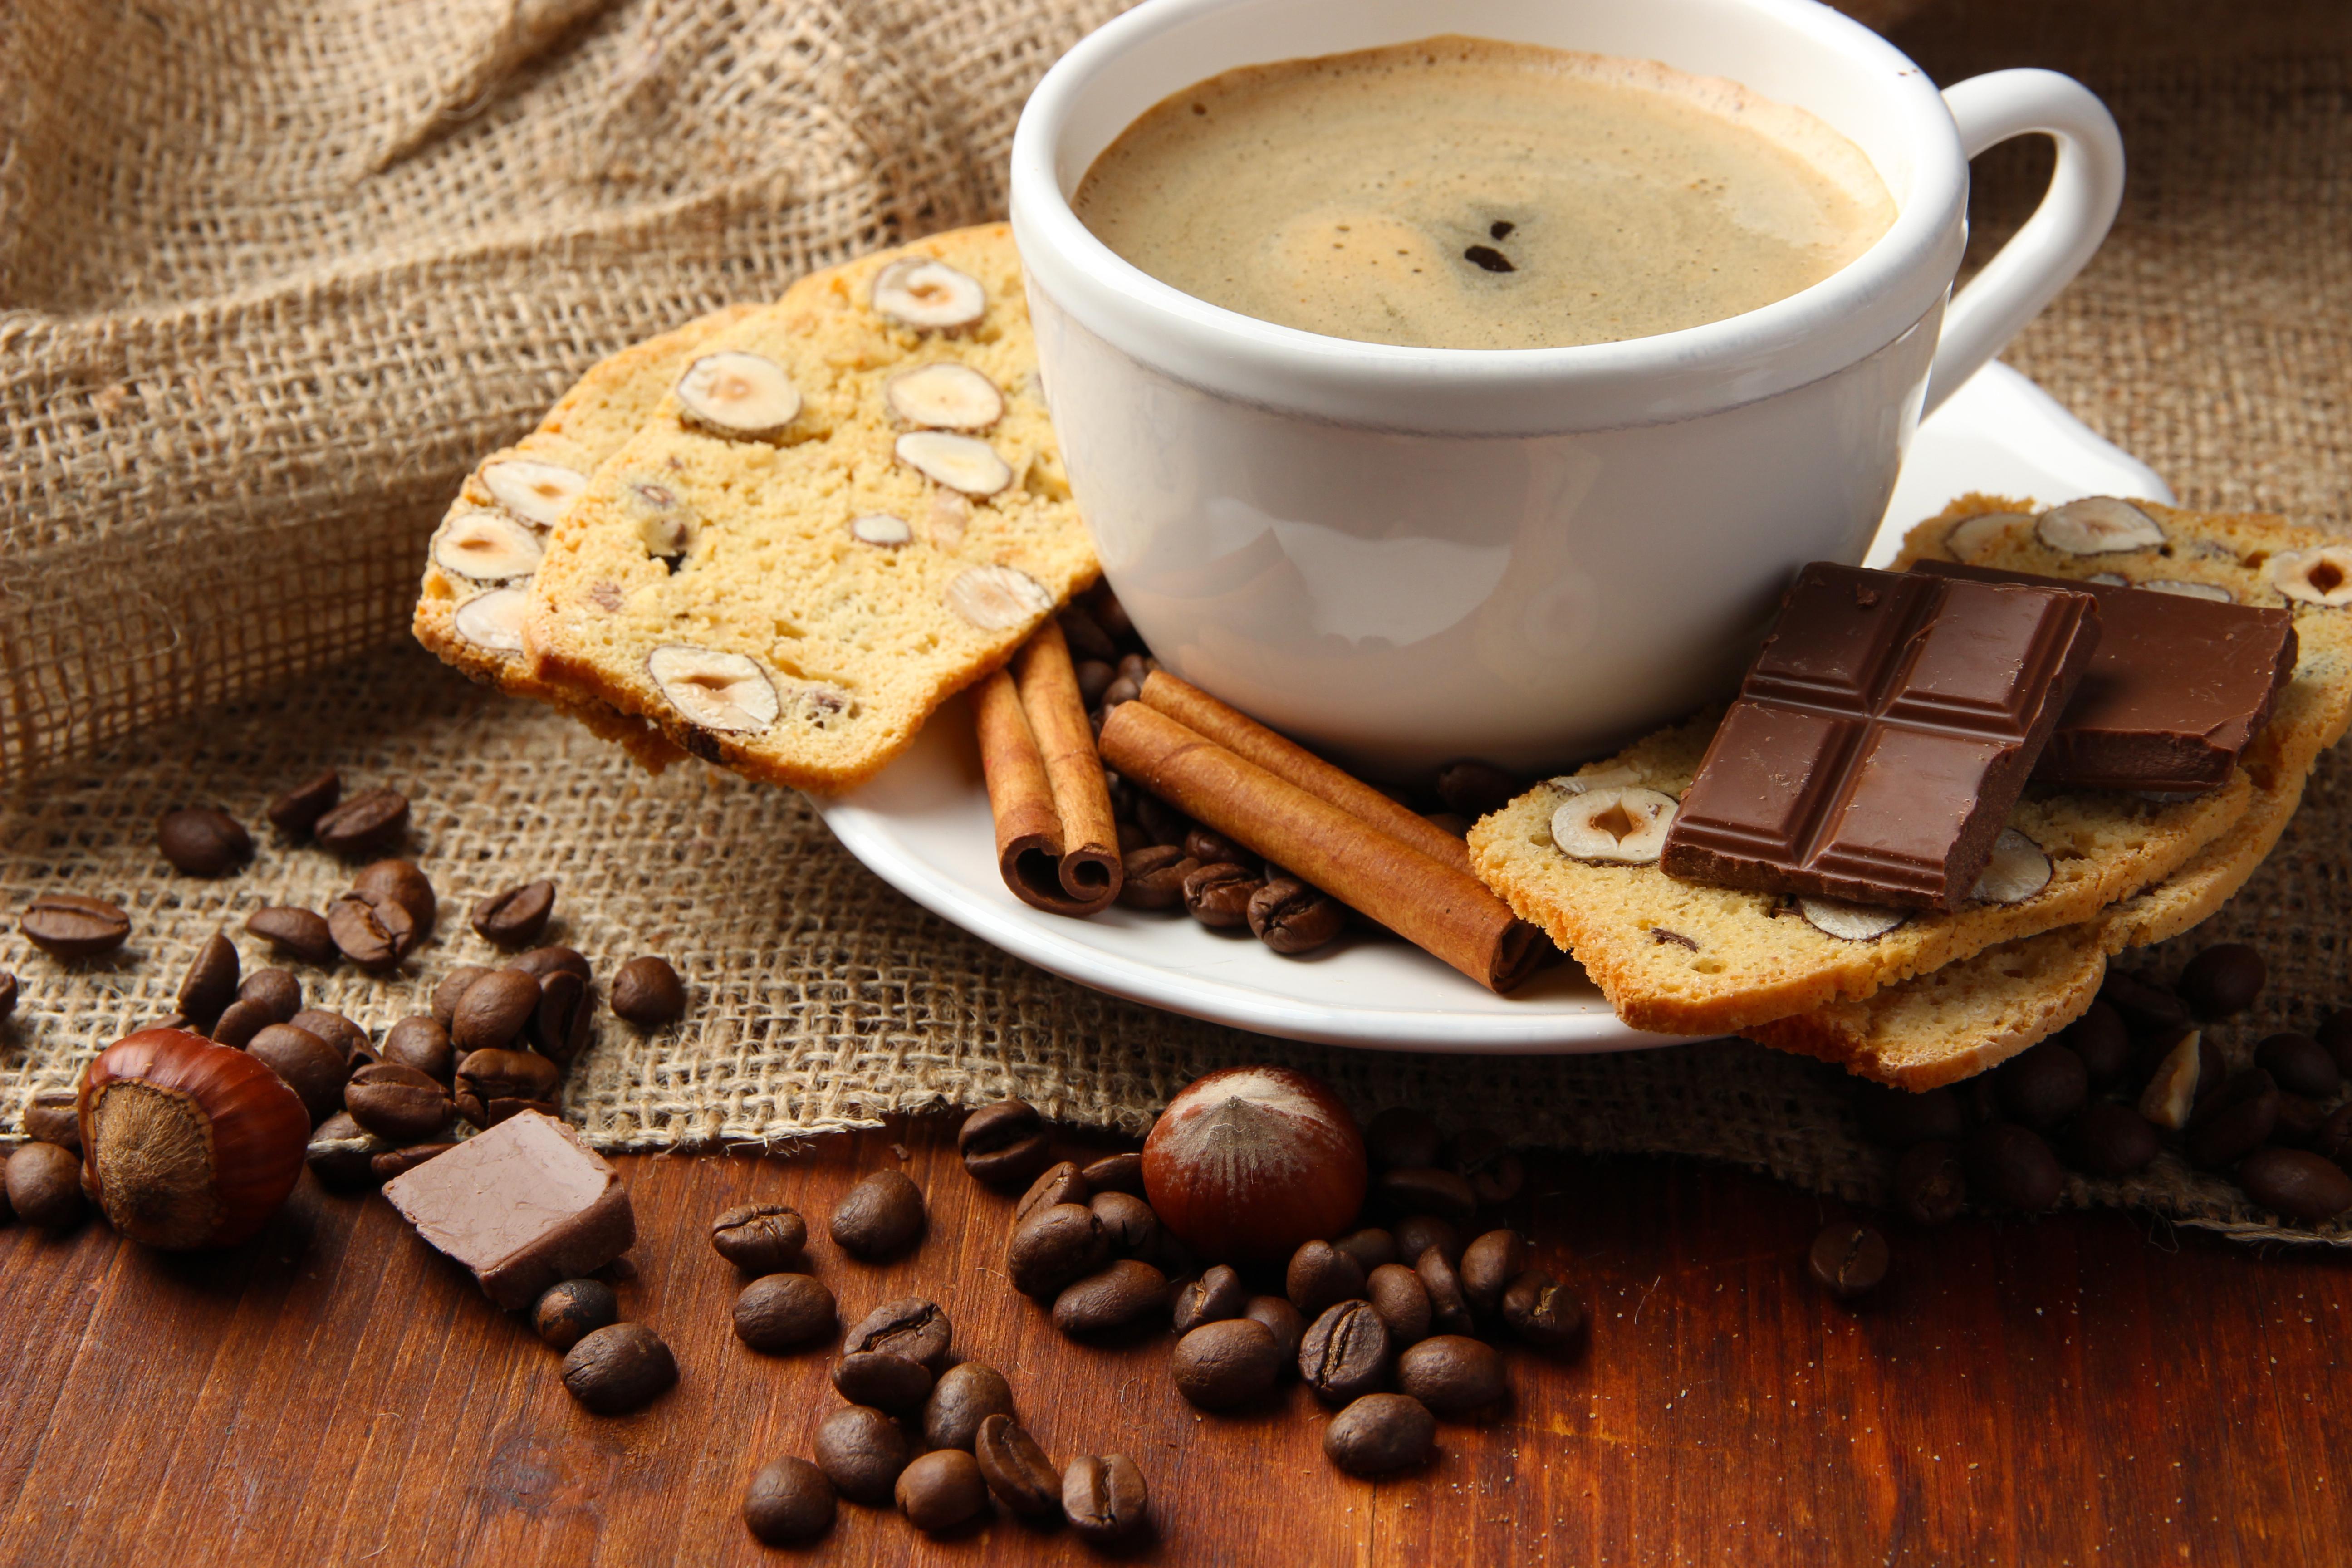 Картинка чашечка кофе и шоколад